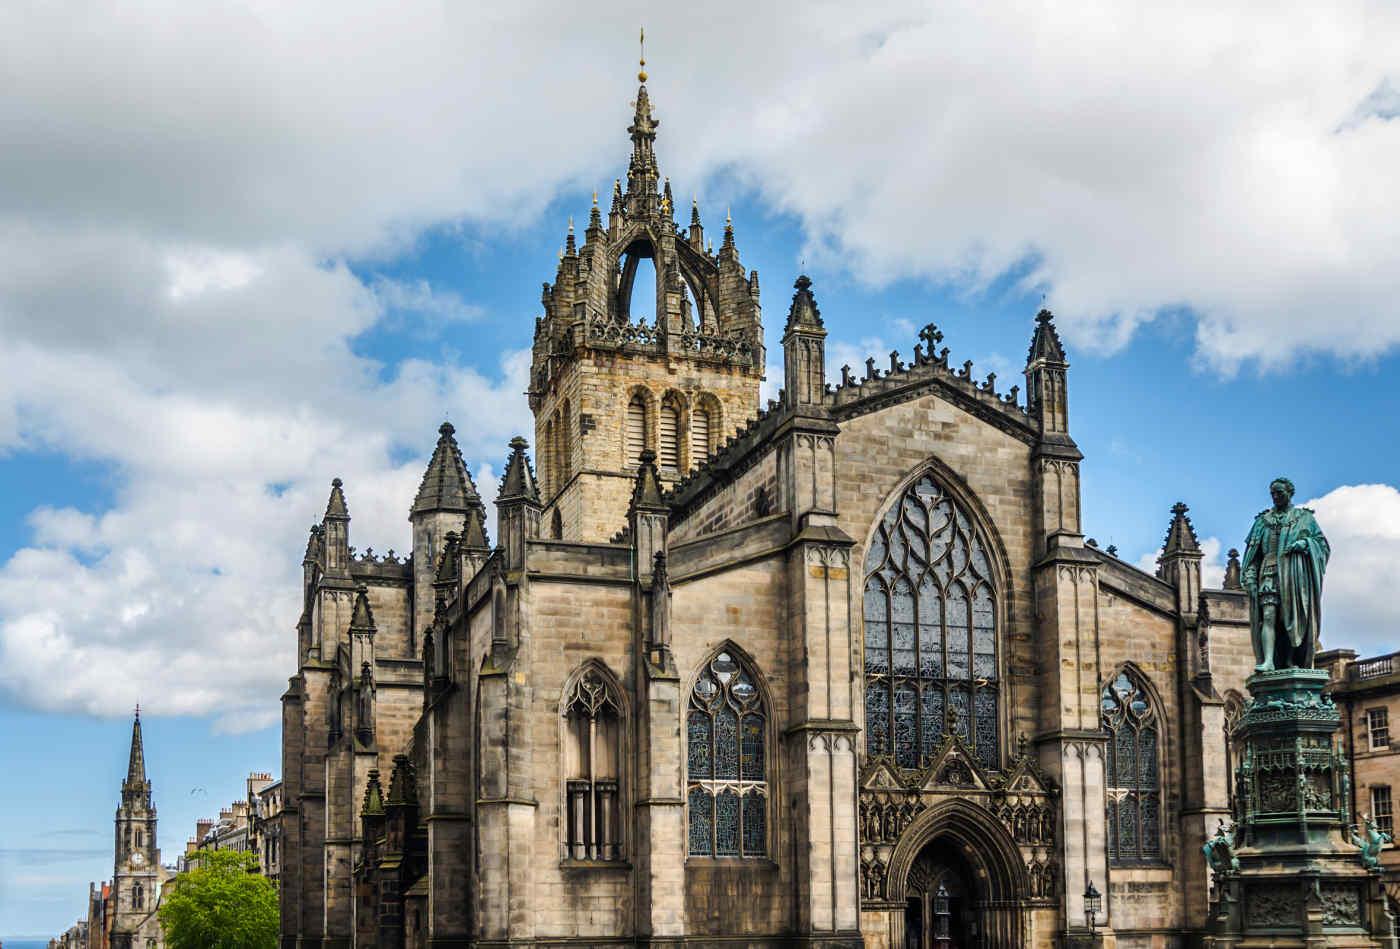 Giles Cathedral in Edinburgh, Scotland